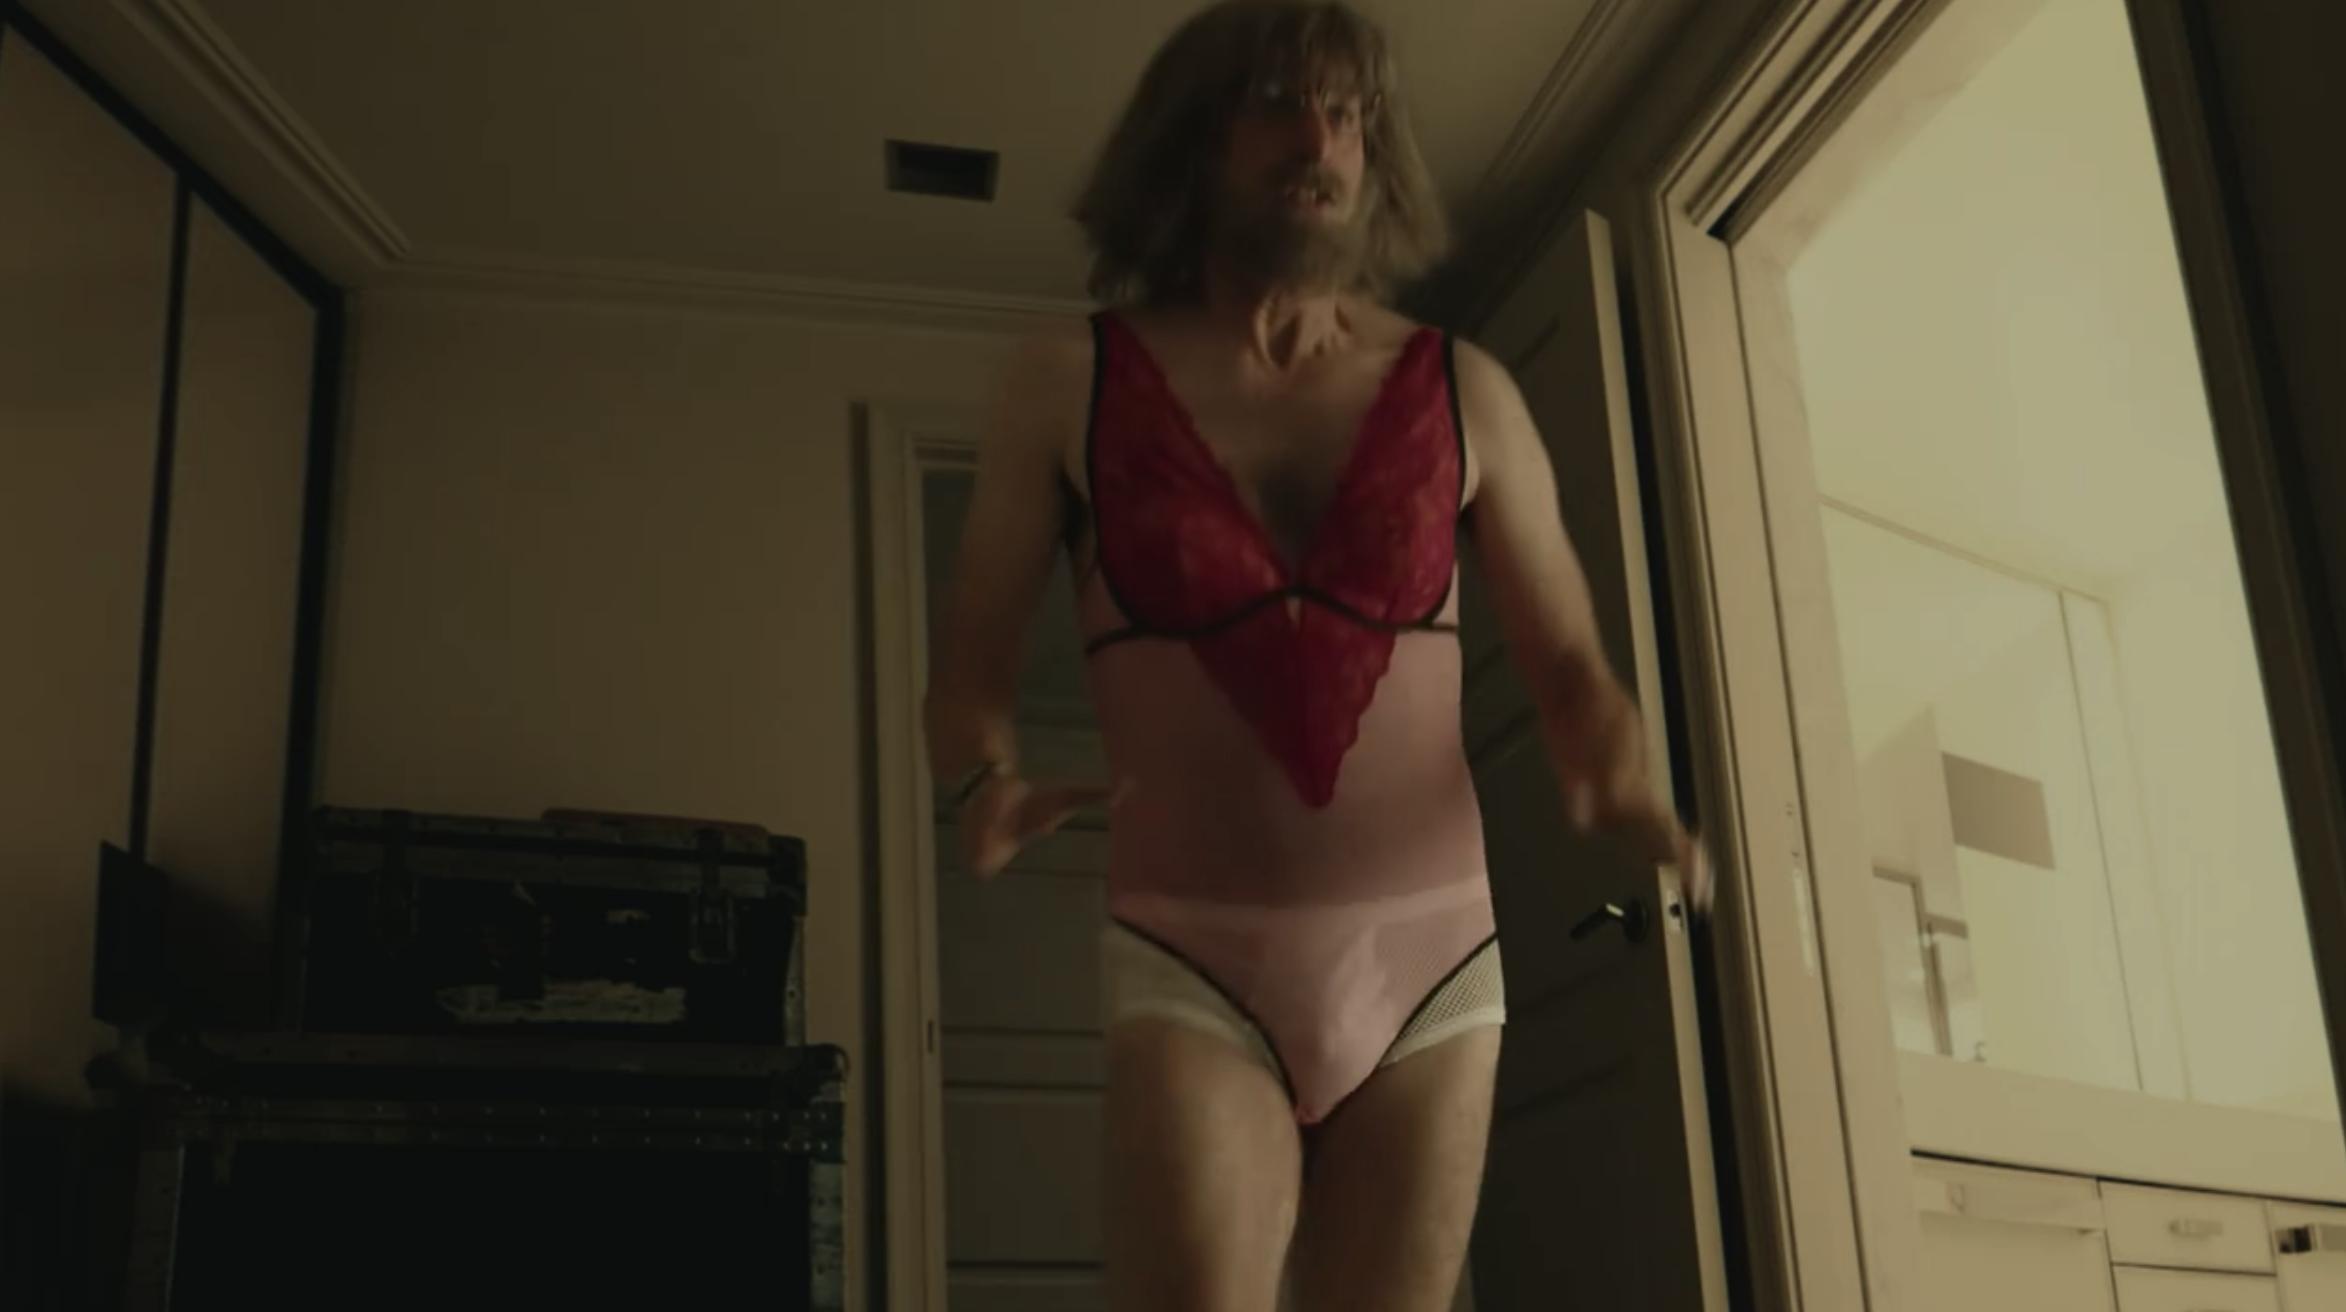 Sacha wearing lingerie